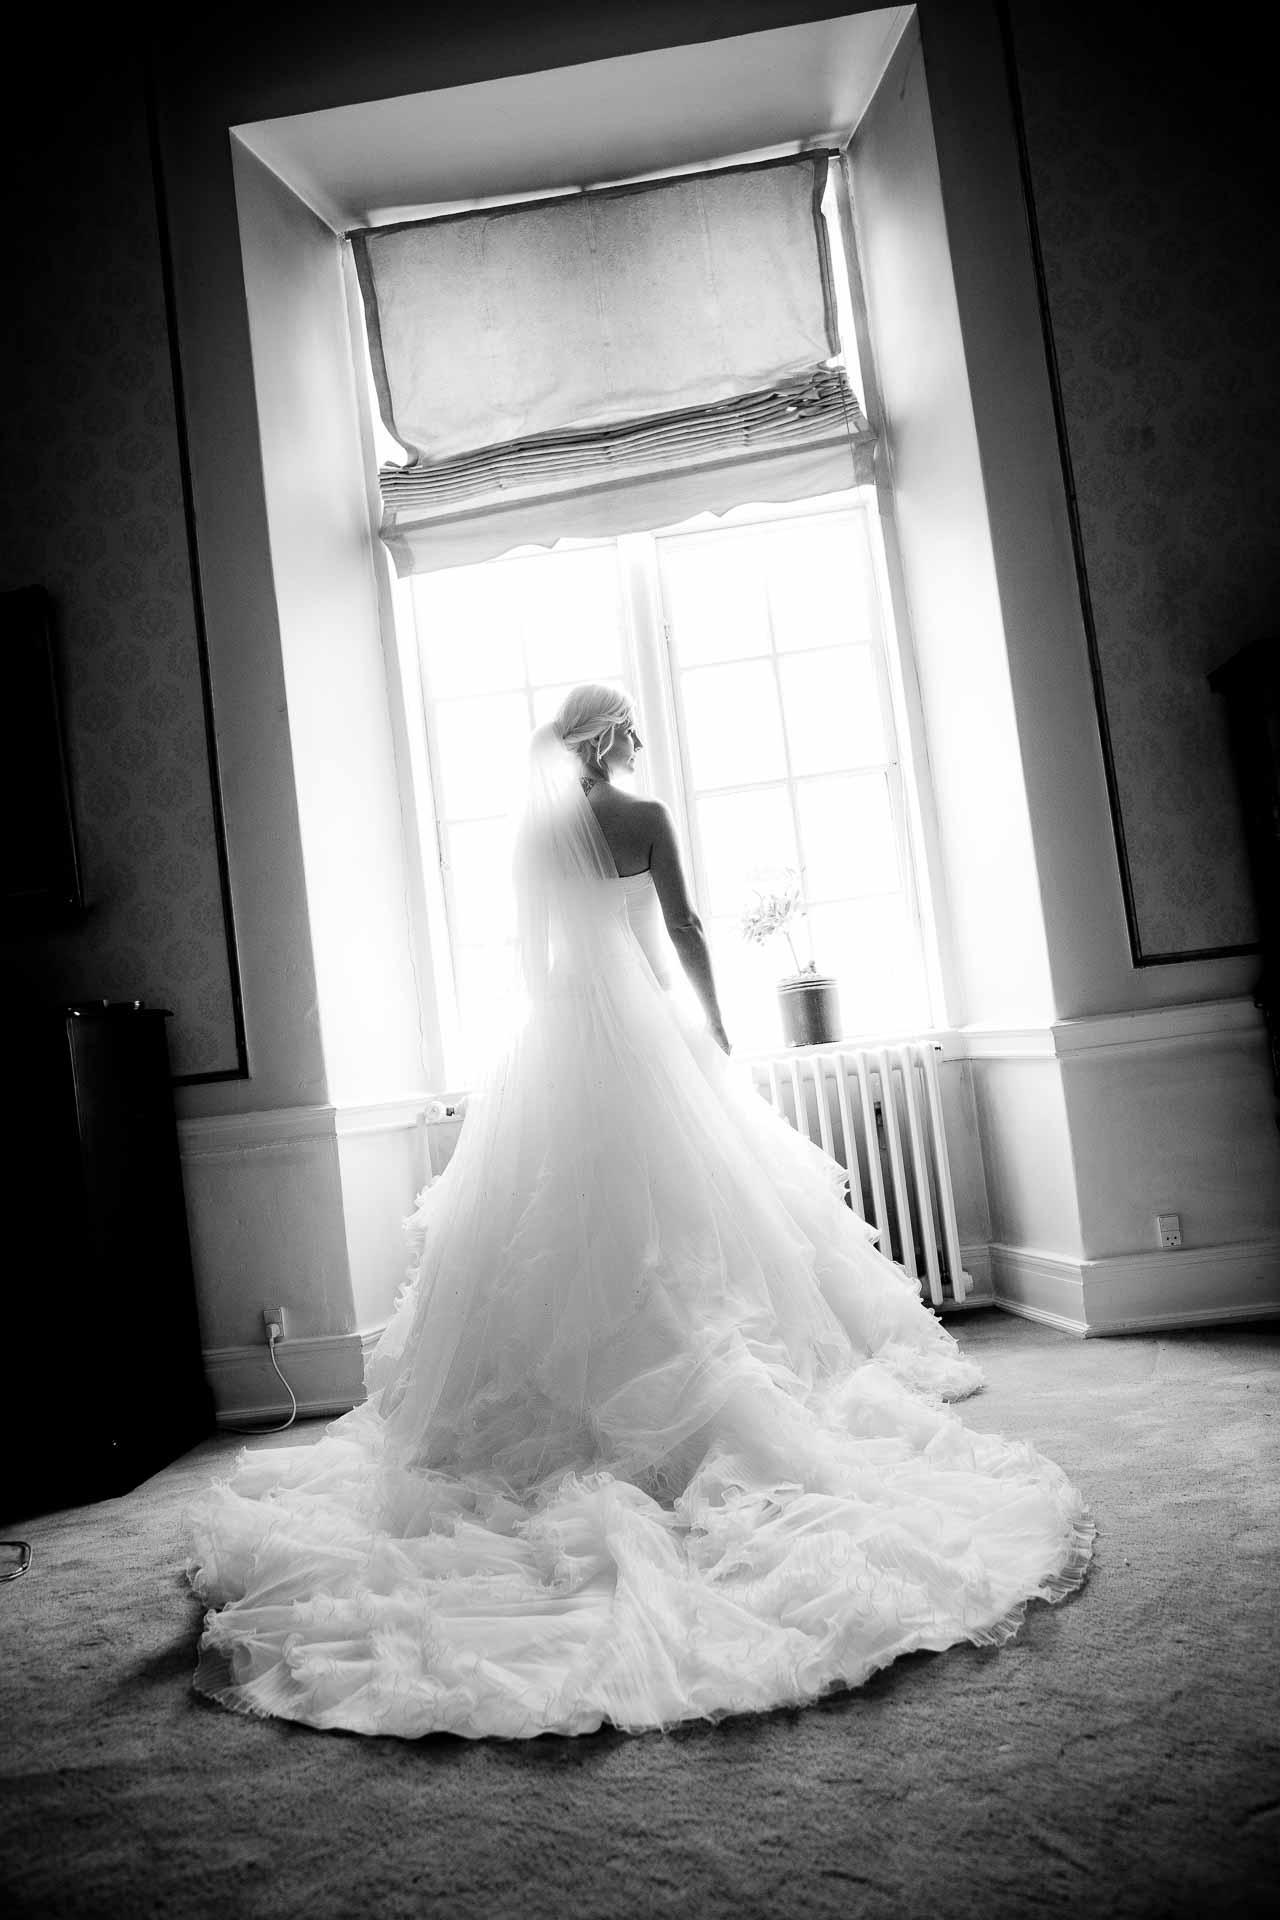 Bryllupsfotograf Fyn | 100% tilfredshedsgaranti